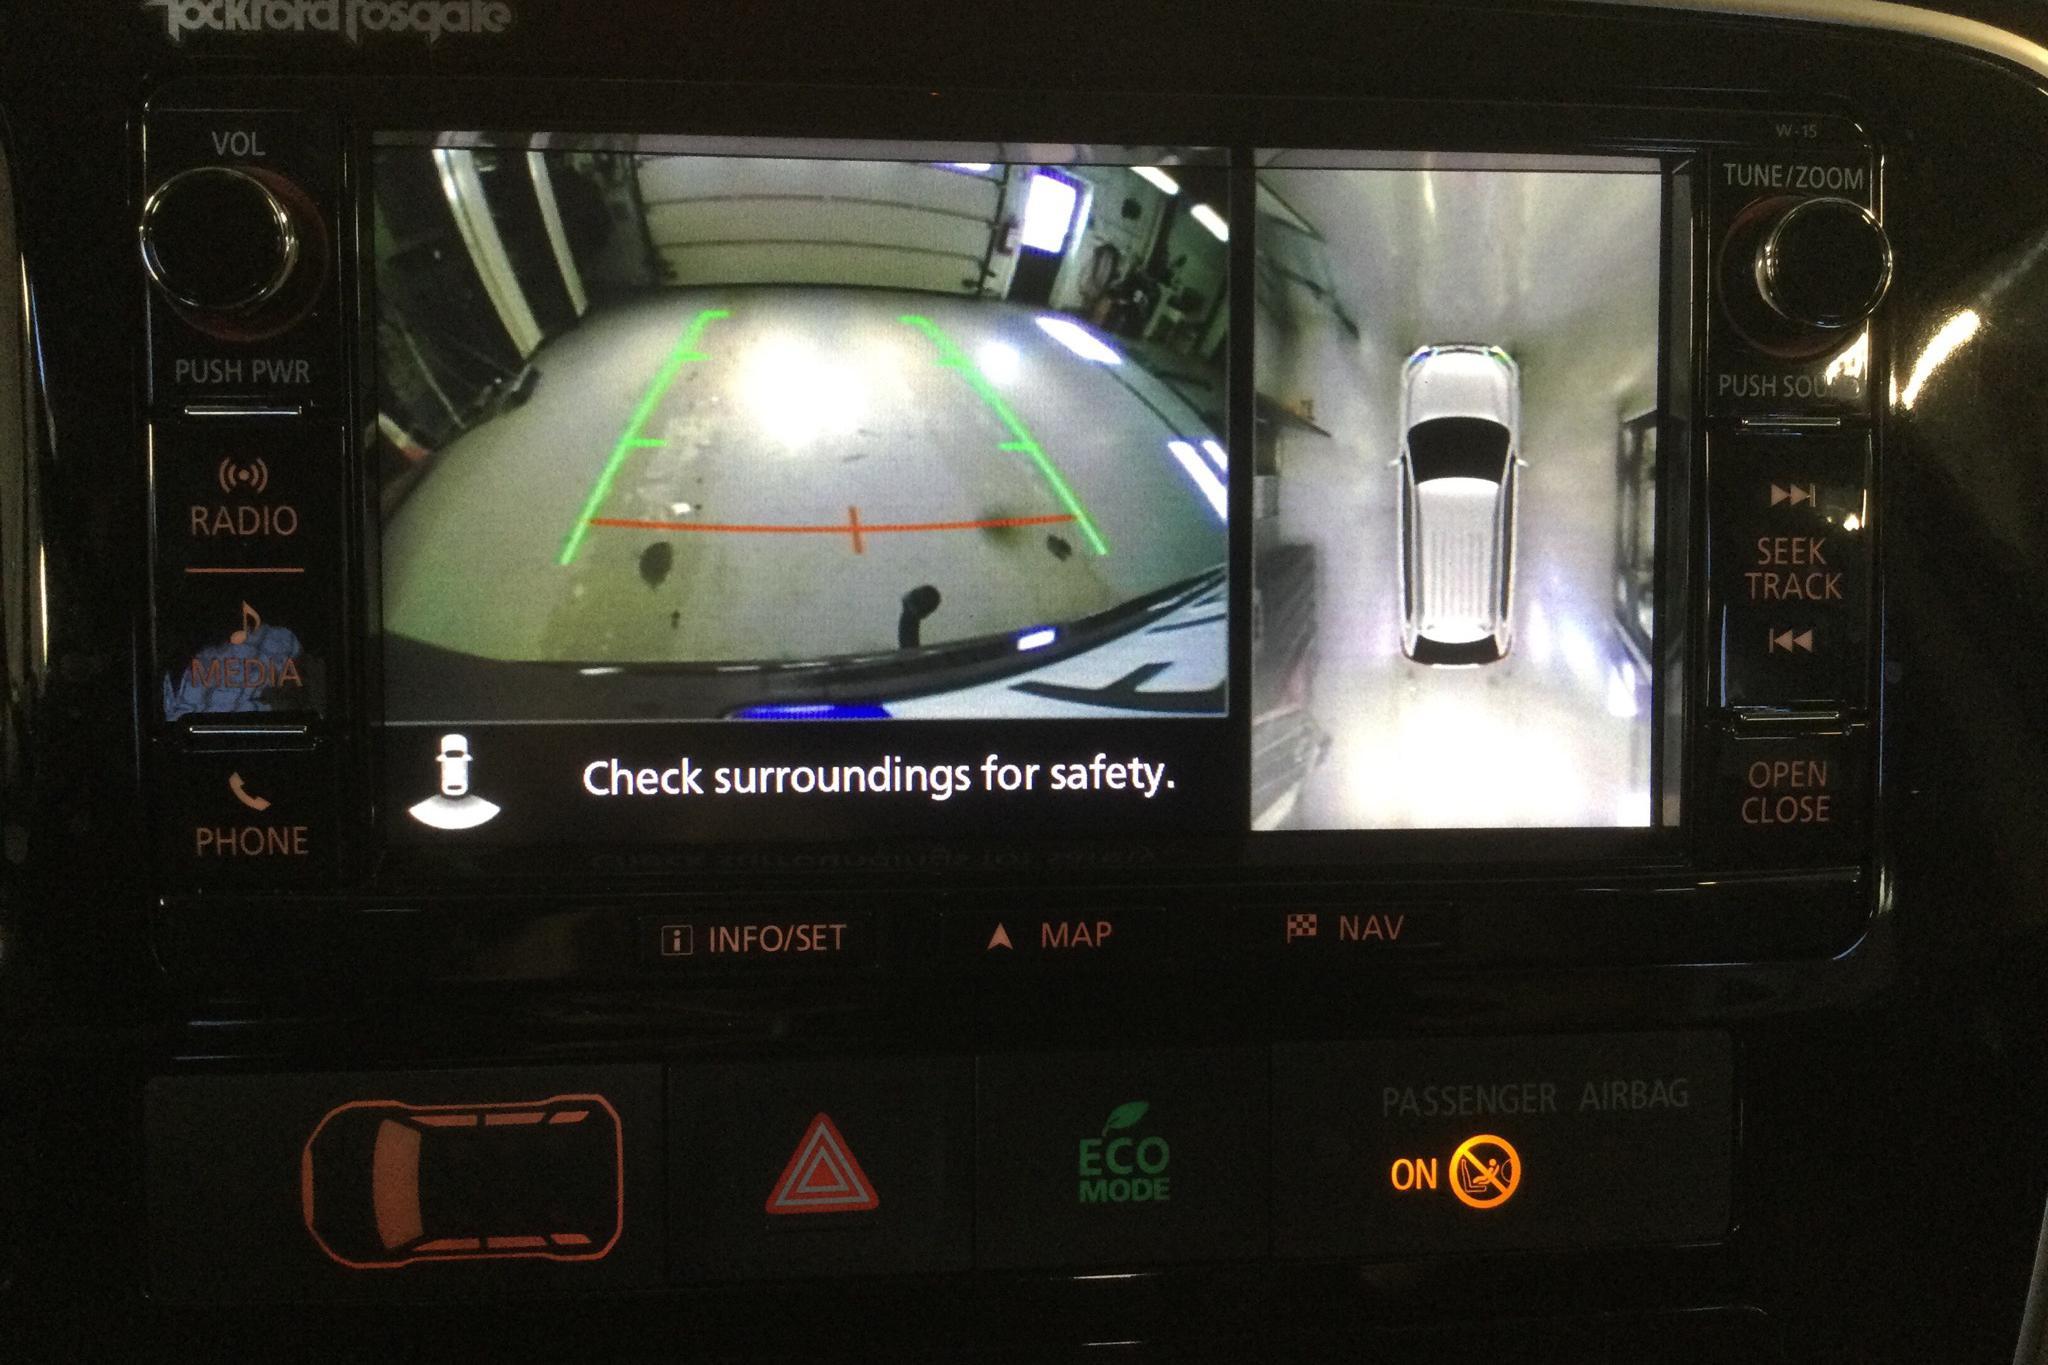 Mitsubishi Outlander 2.0 Plug-in Hybrid 4WD (121hk) - 20 279 mil - Automat - svart - 2016